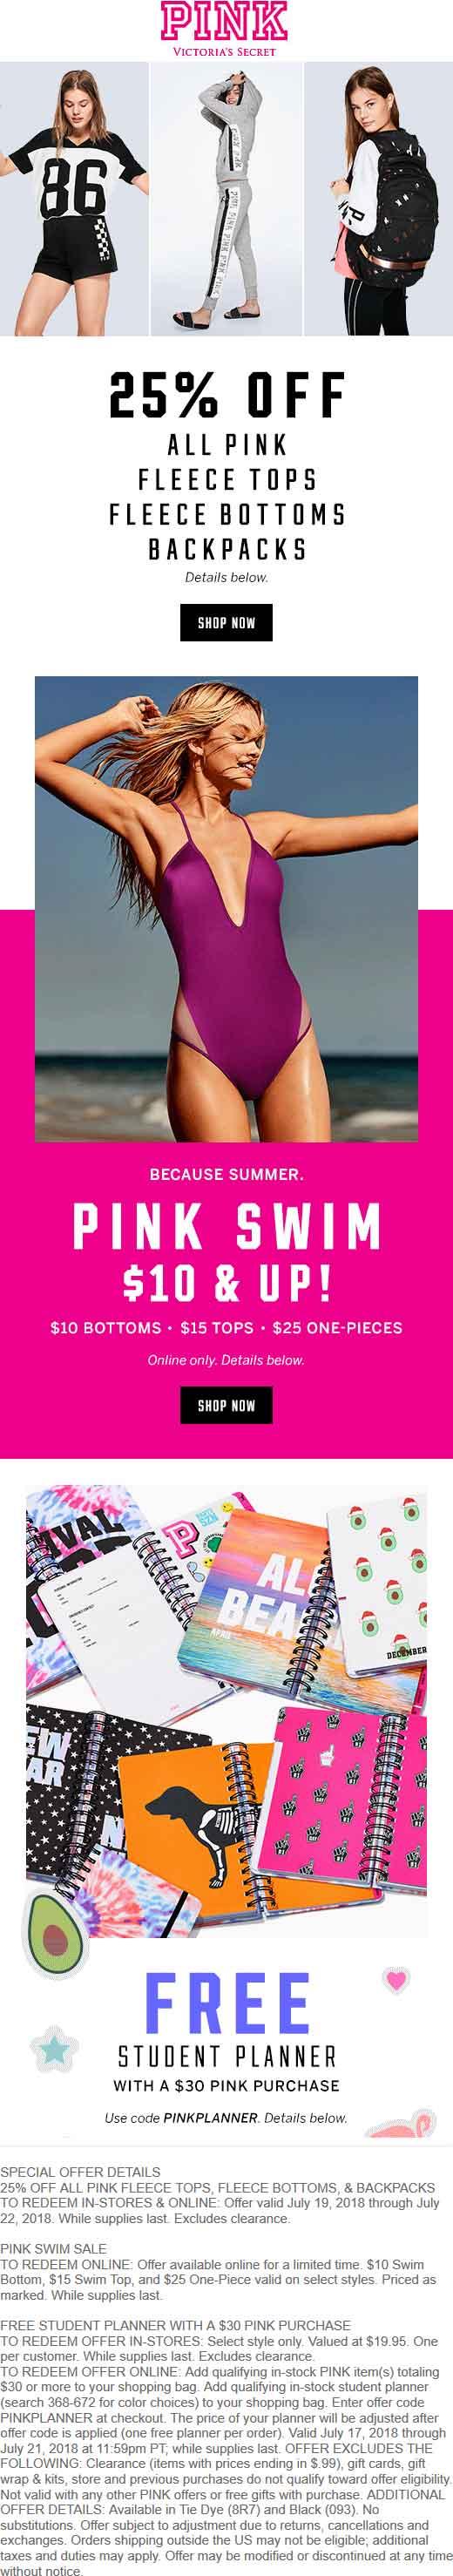 VictoriasSecret.com Promo Coupon 25% off fleece & backpacks + more at Victorias Secret PINK, ditto online